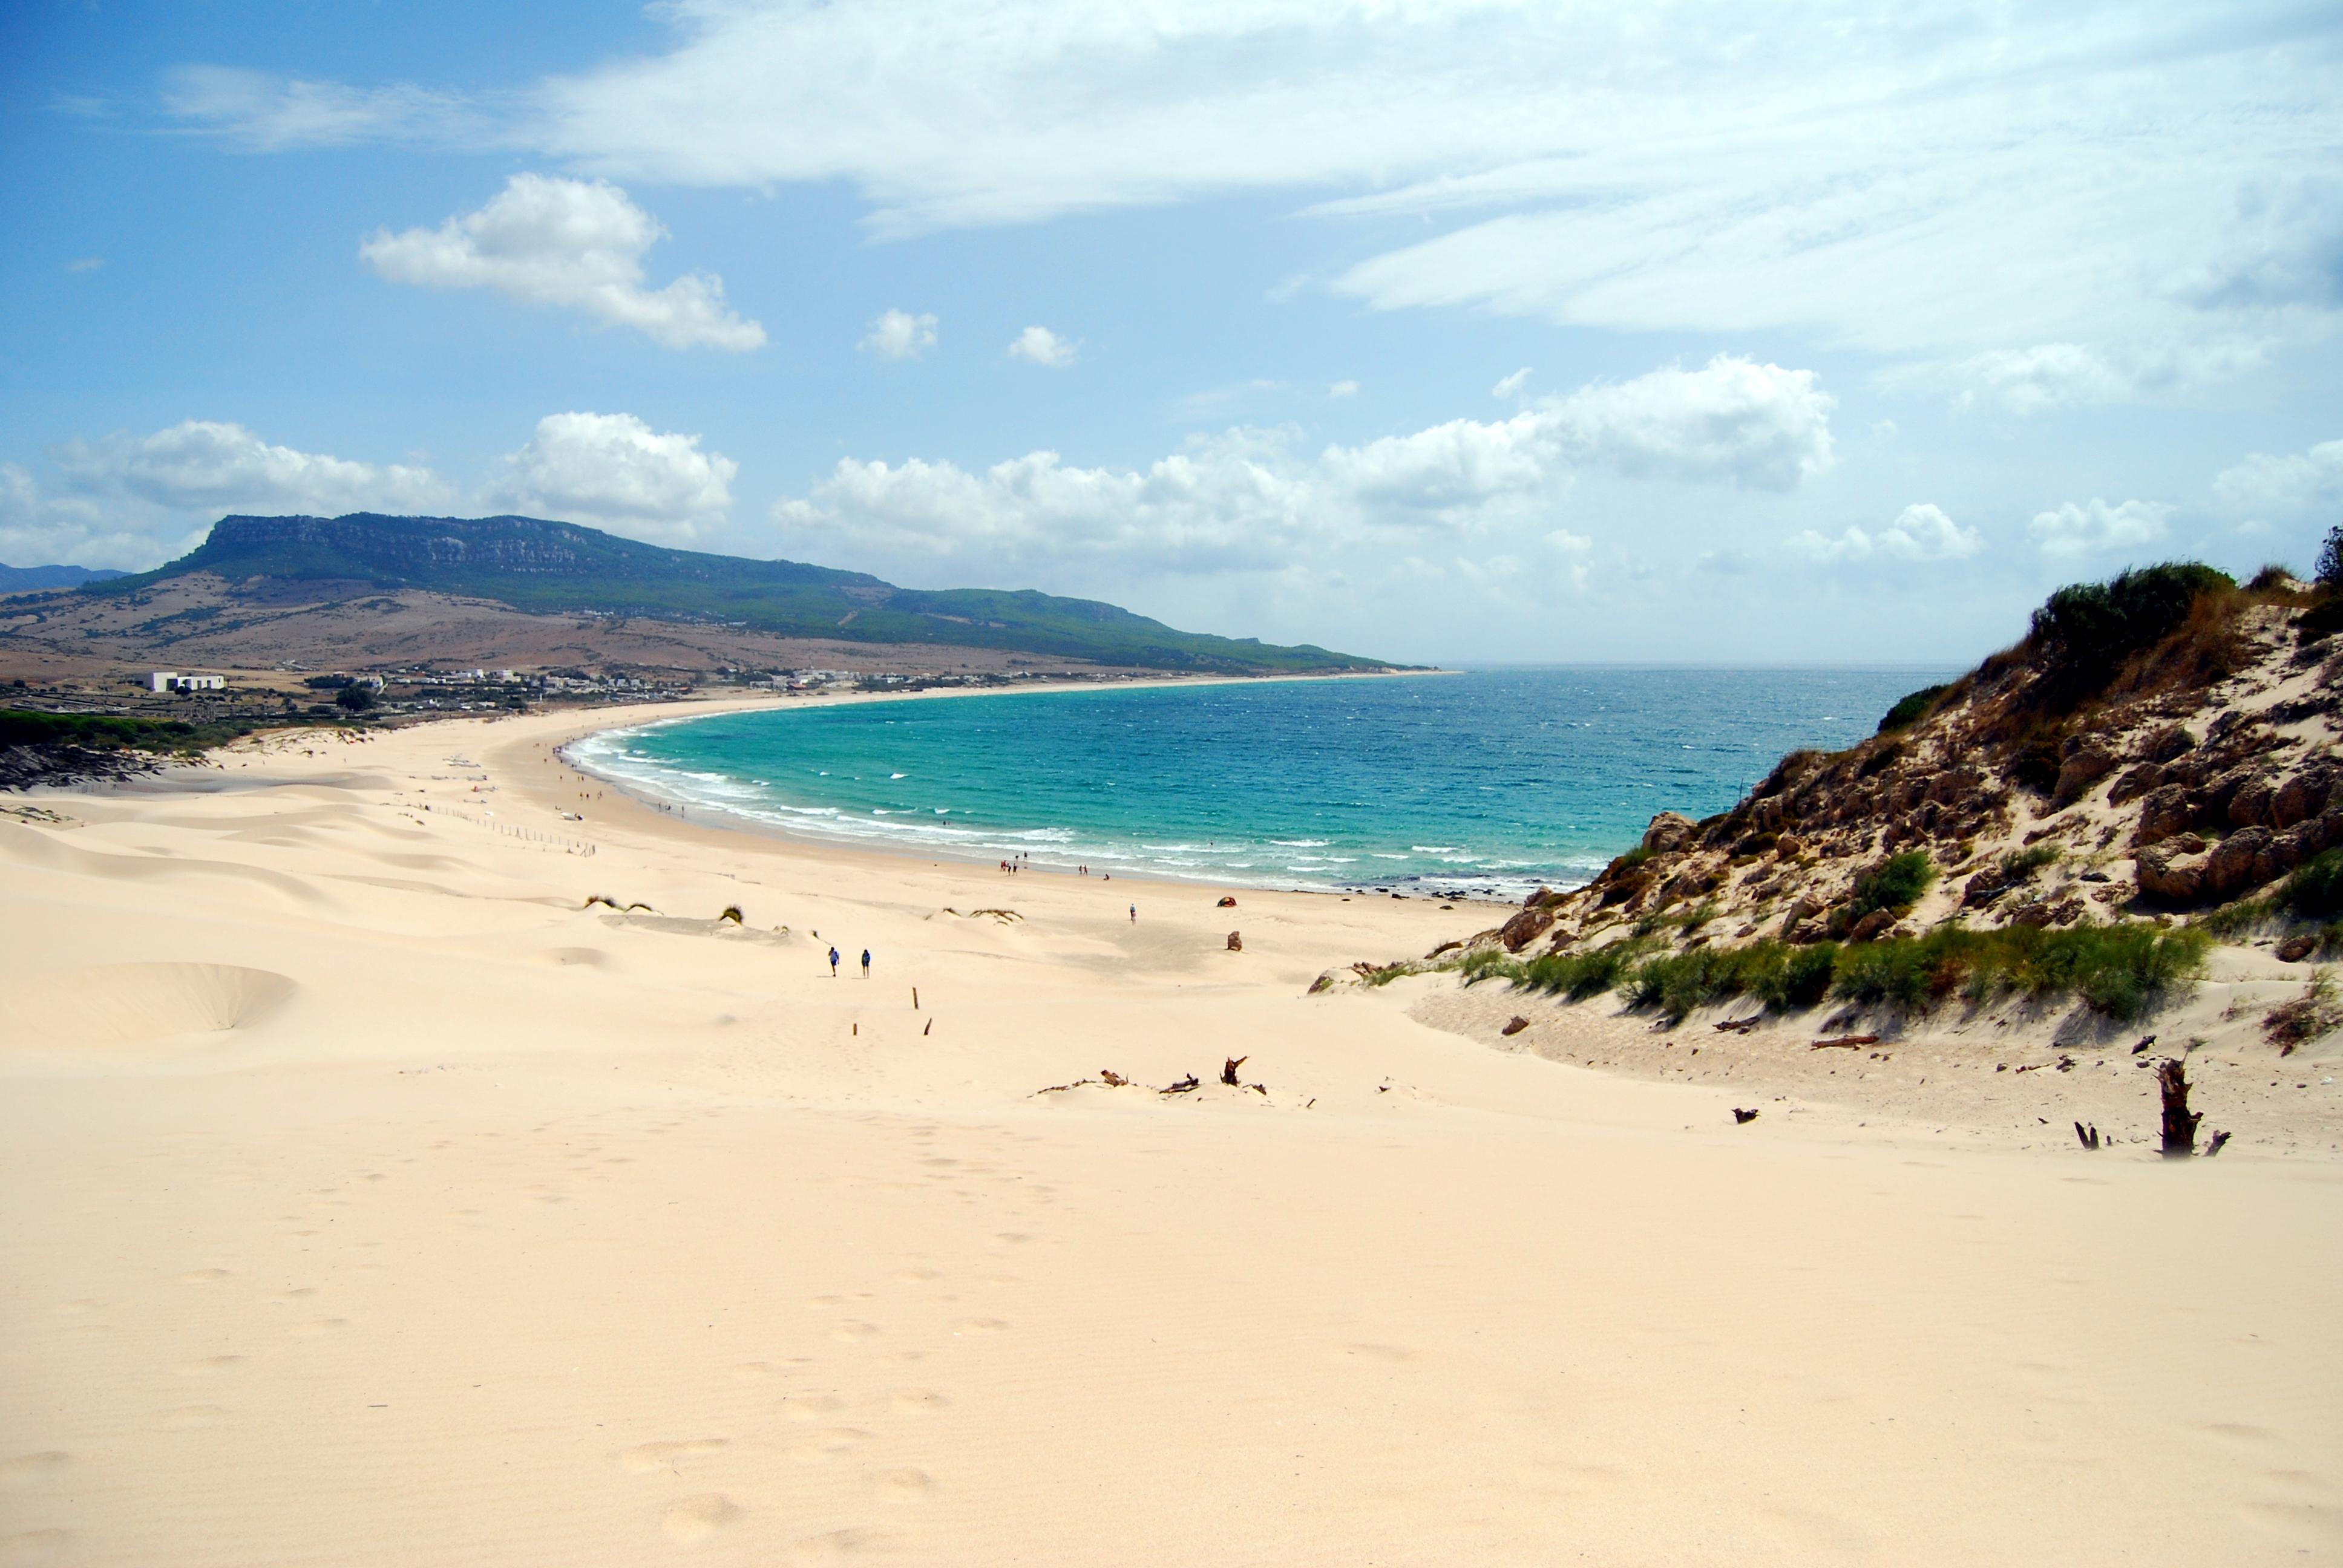 Bolonia beaches, Andalusia, Spain